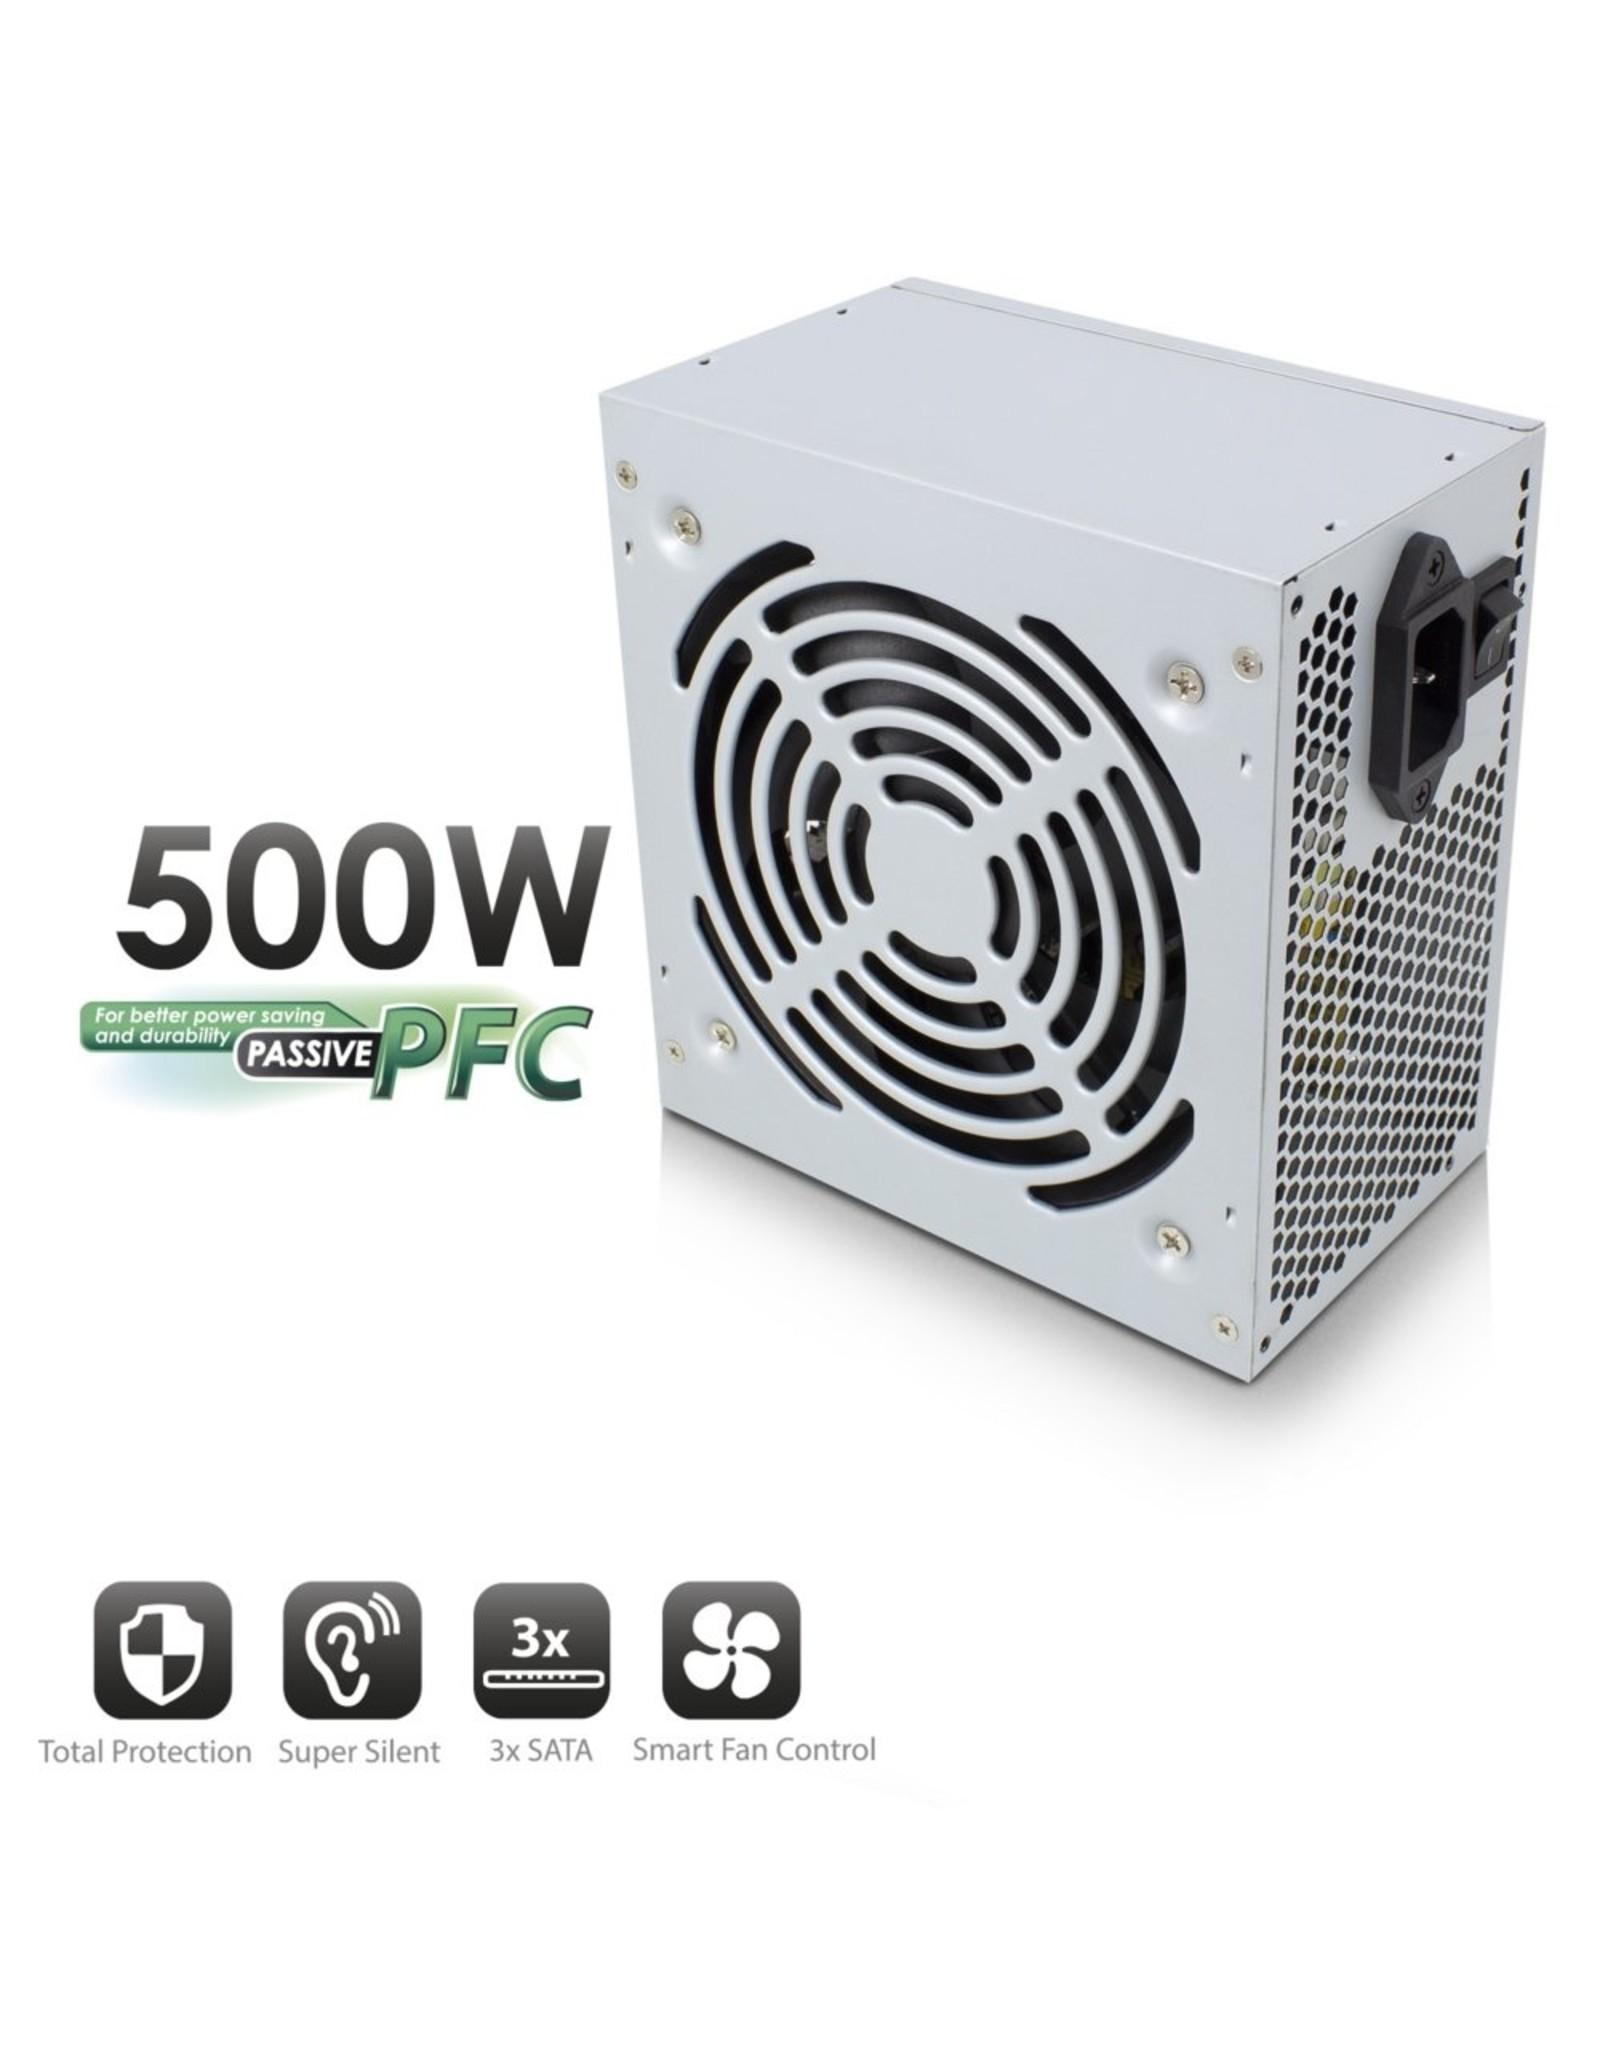 Ewent PSU ATX 500W, PPFC, V3.1, 3xSata